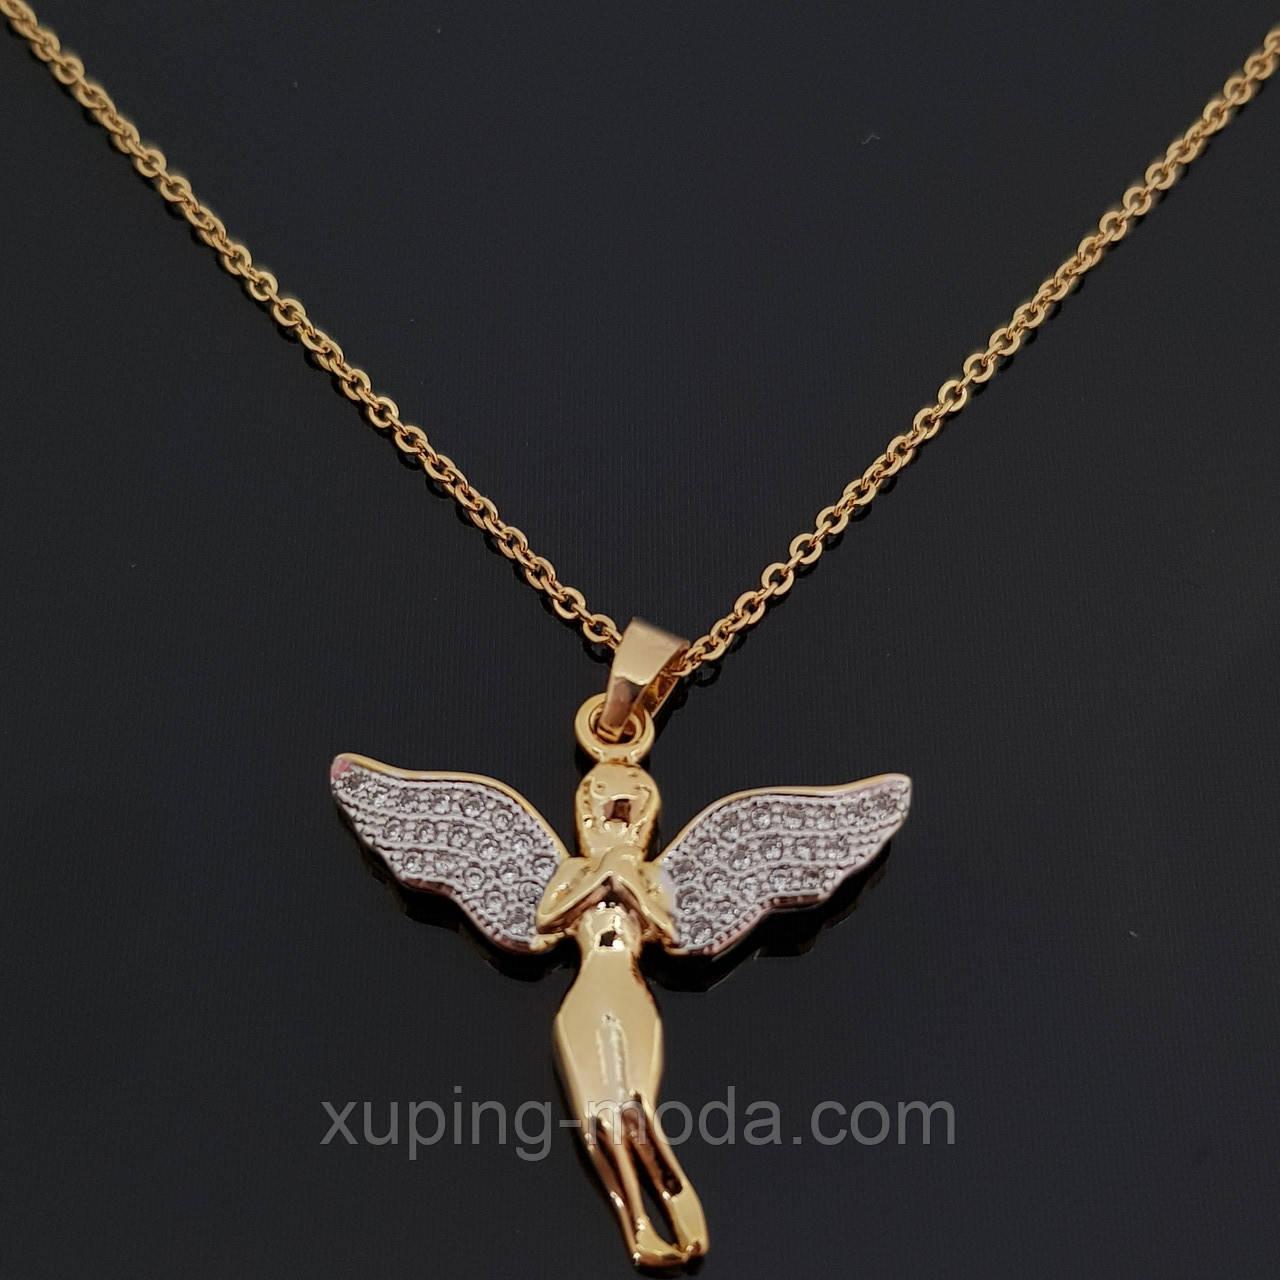 Кулон ангел. Цепочка с кулоном недорого